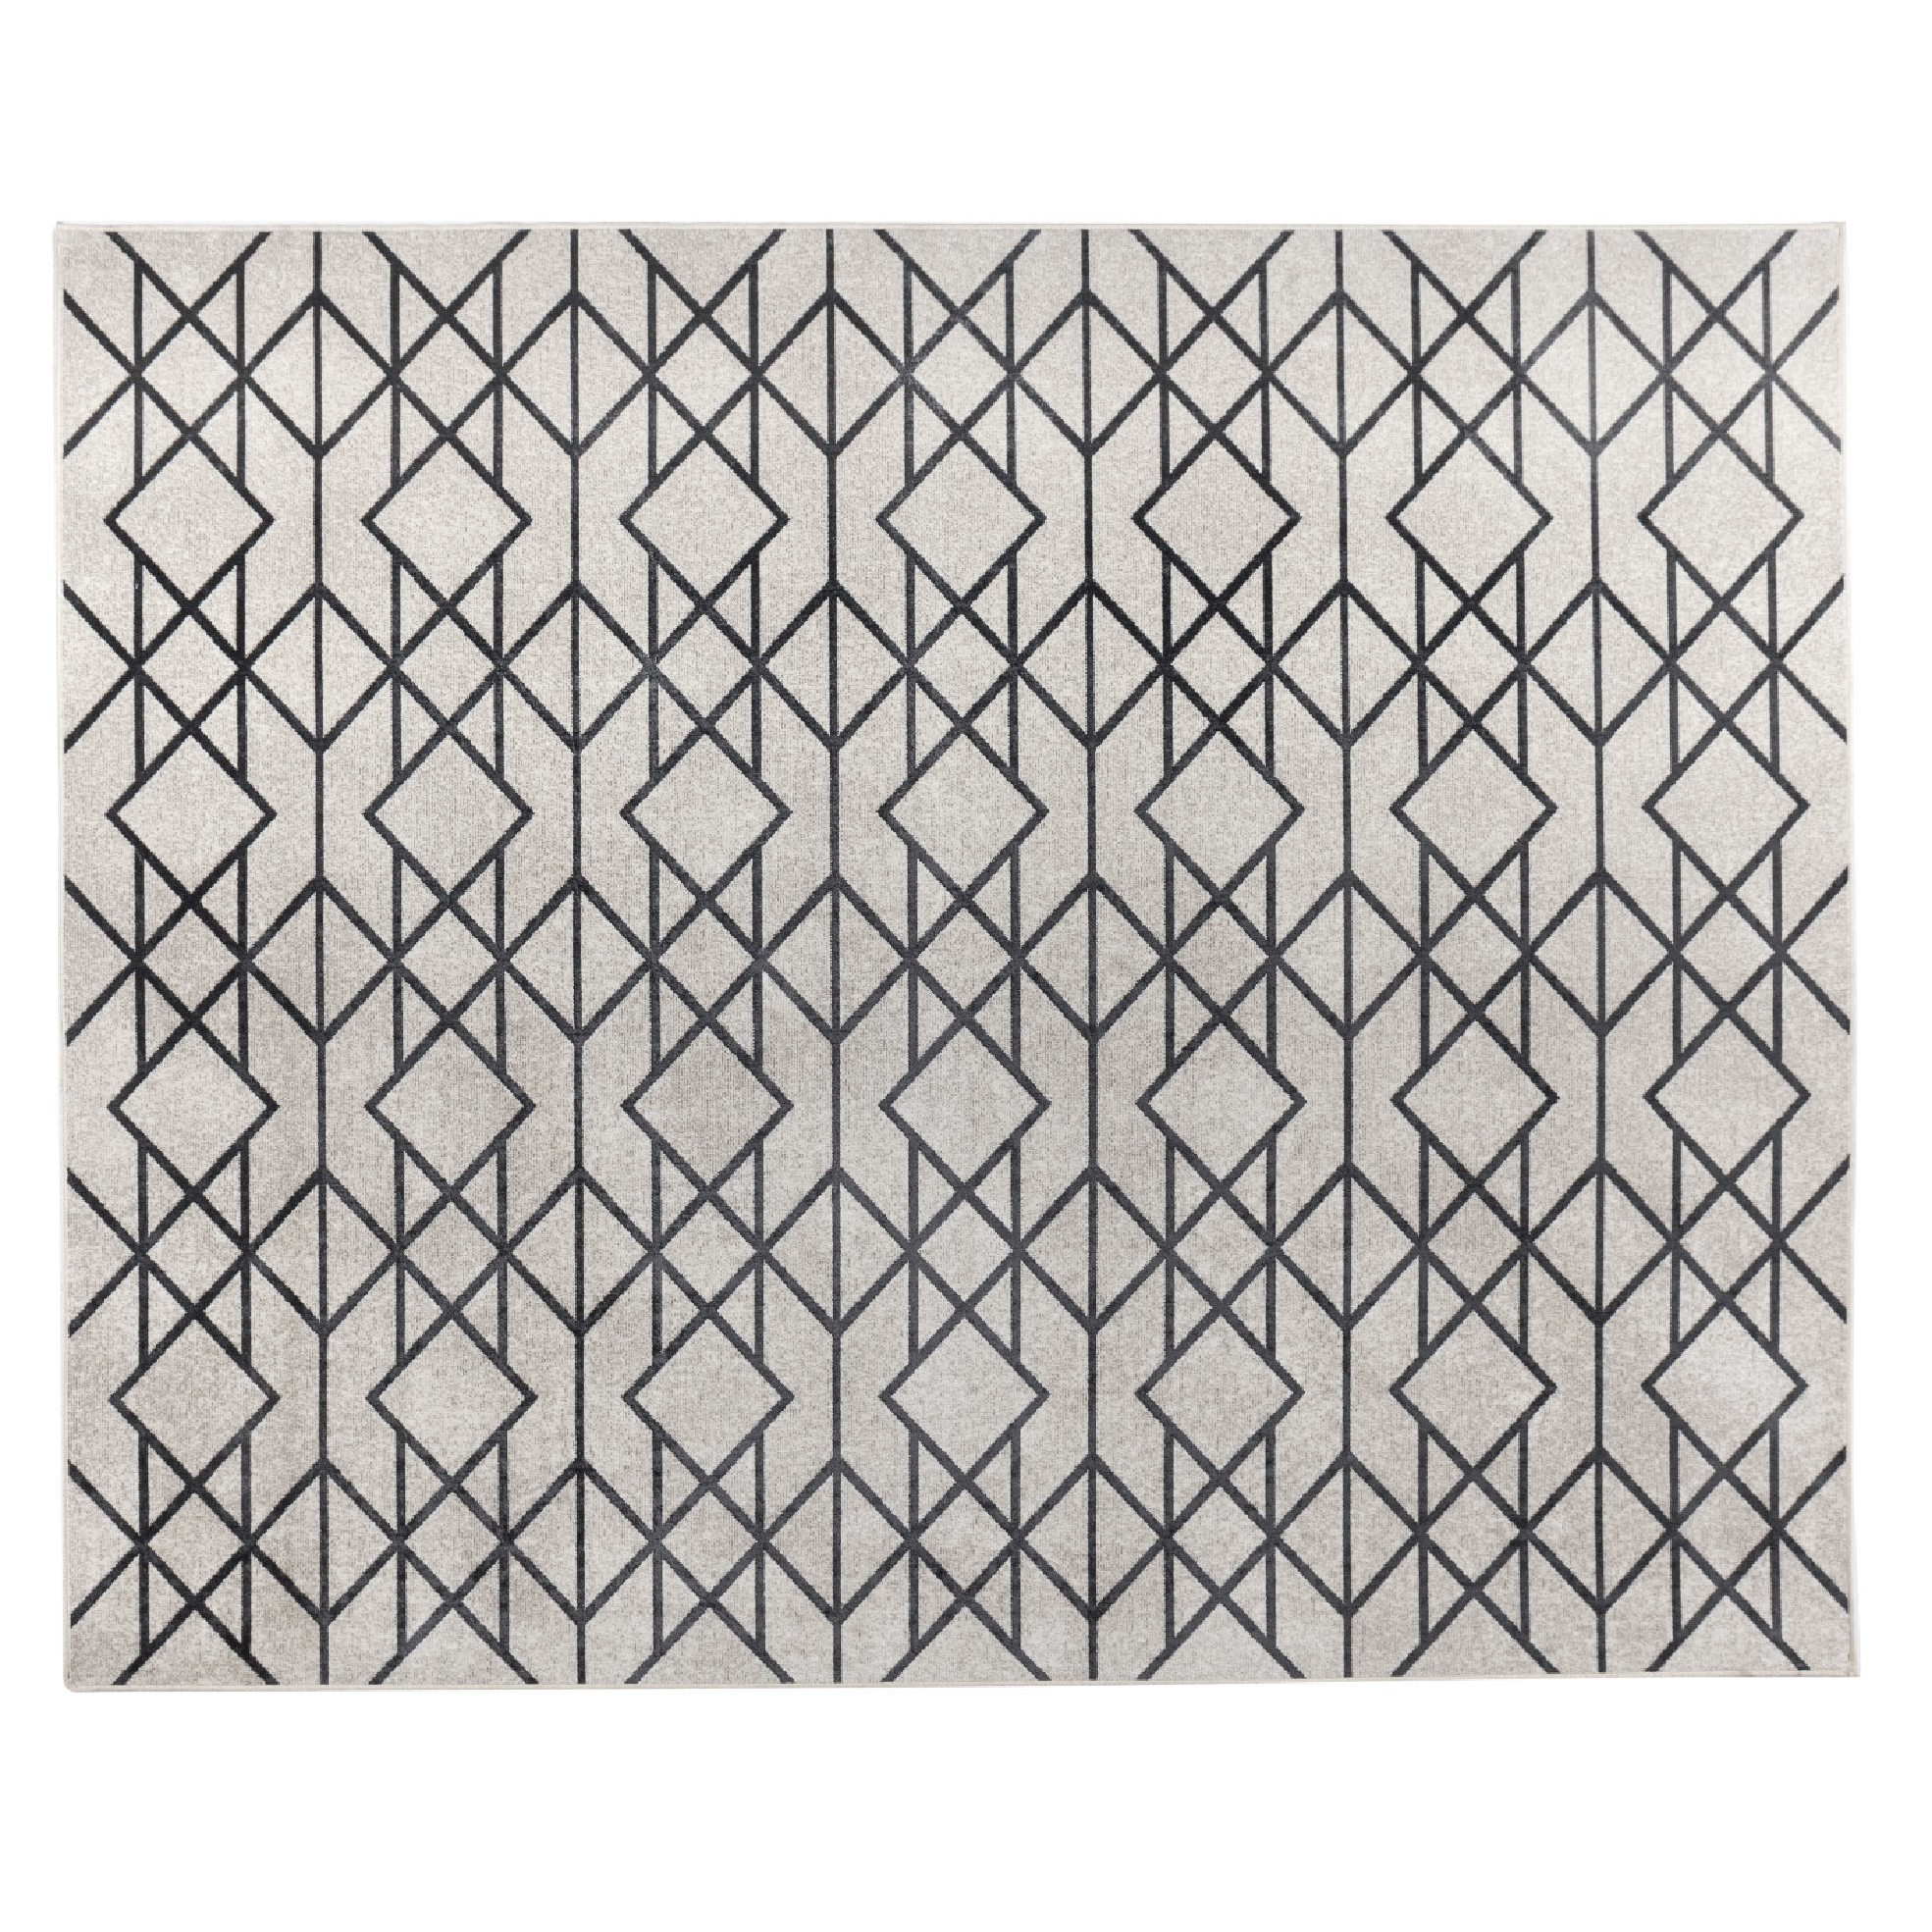 Tapete Retangular Belga 100x140cm - Fatex